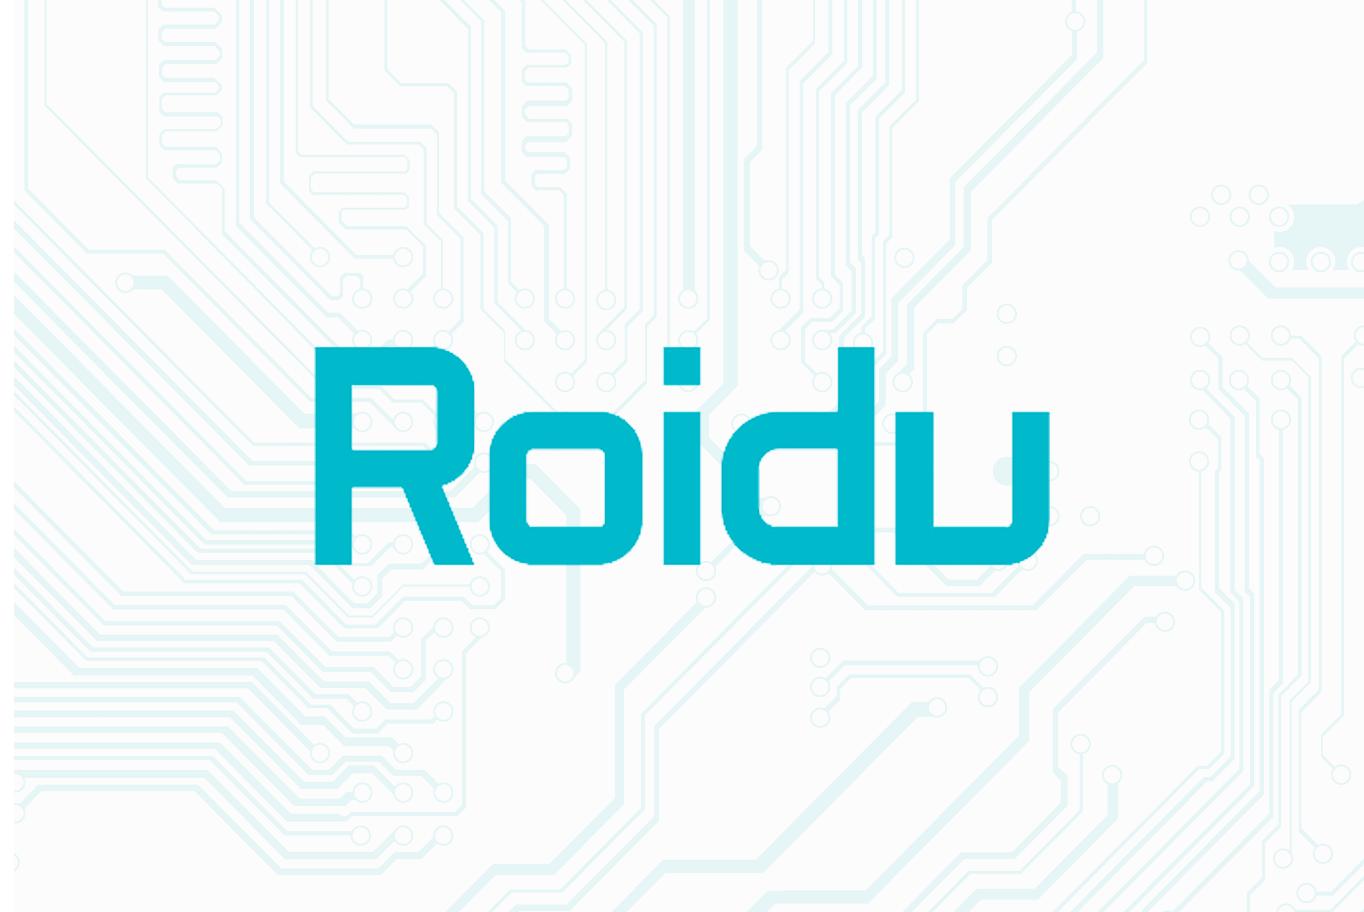 https://www.eficode.com/hubfs/roidu%20(1).png